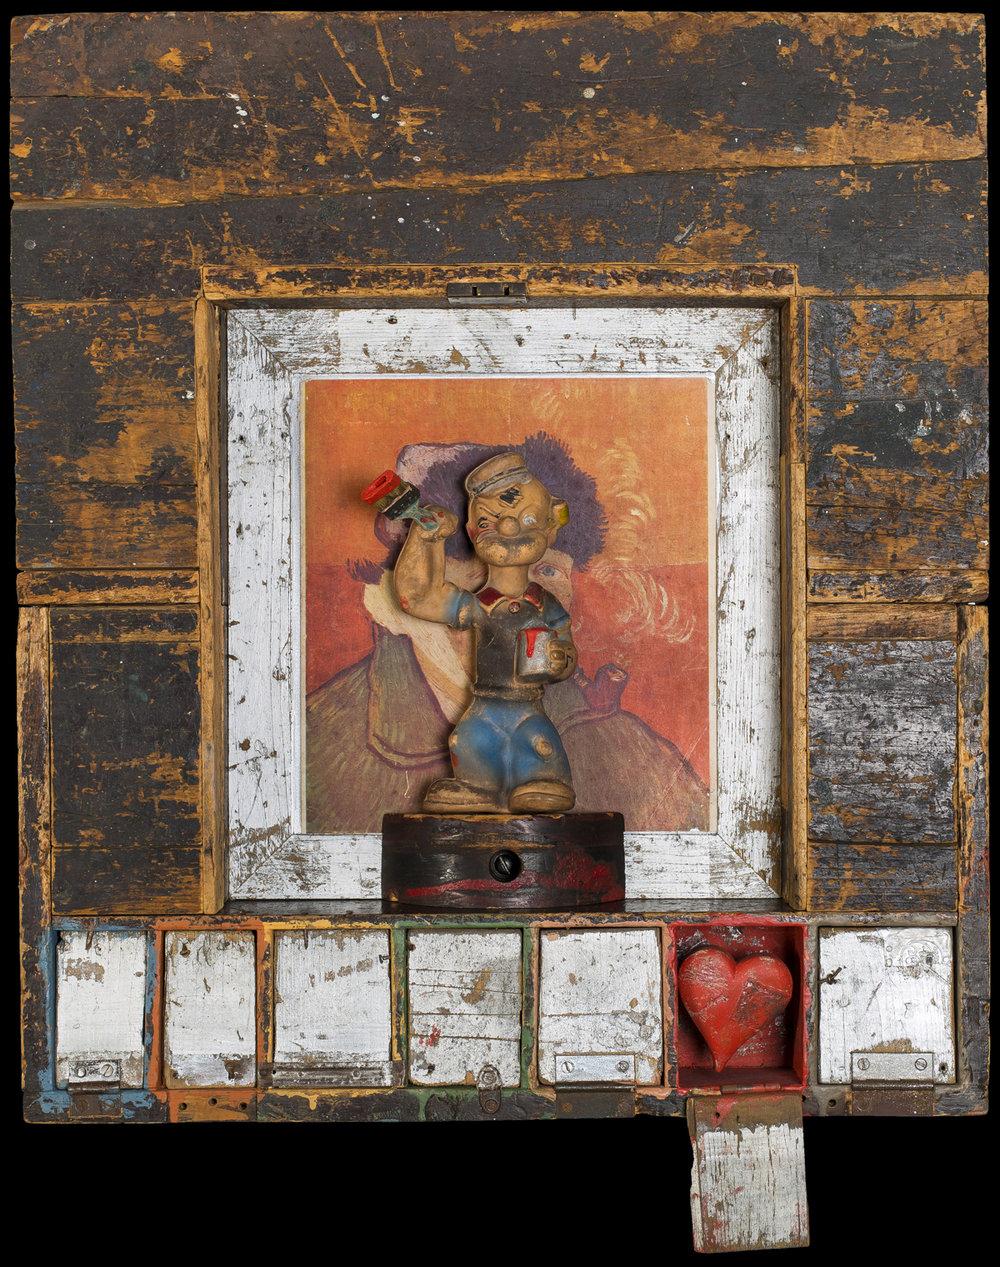 Me & Vince, 2013, 28 x 24 x 5 (Sold)